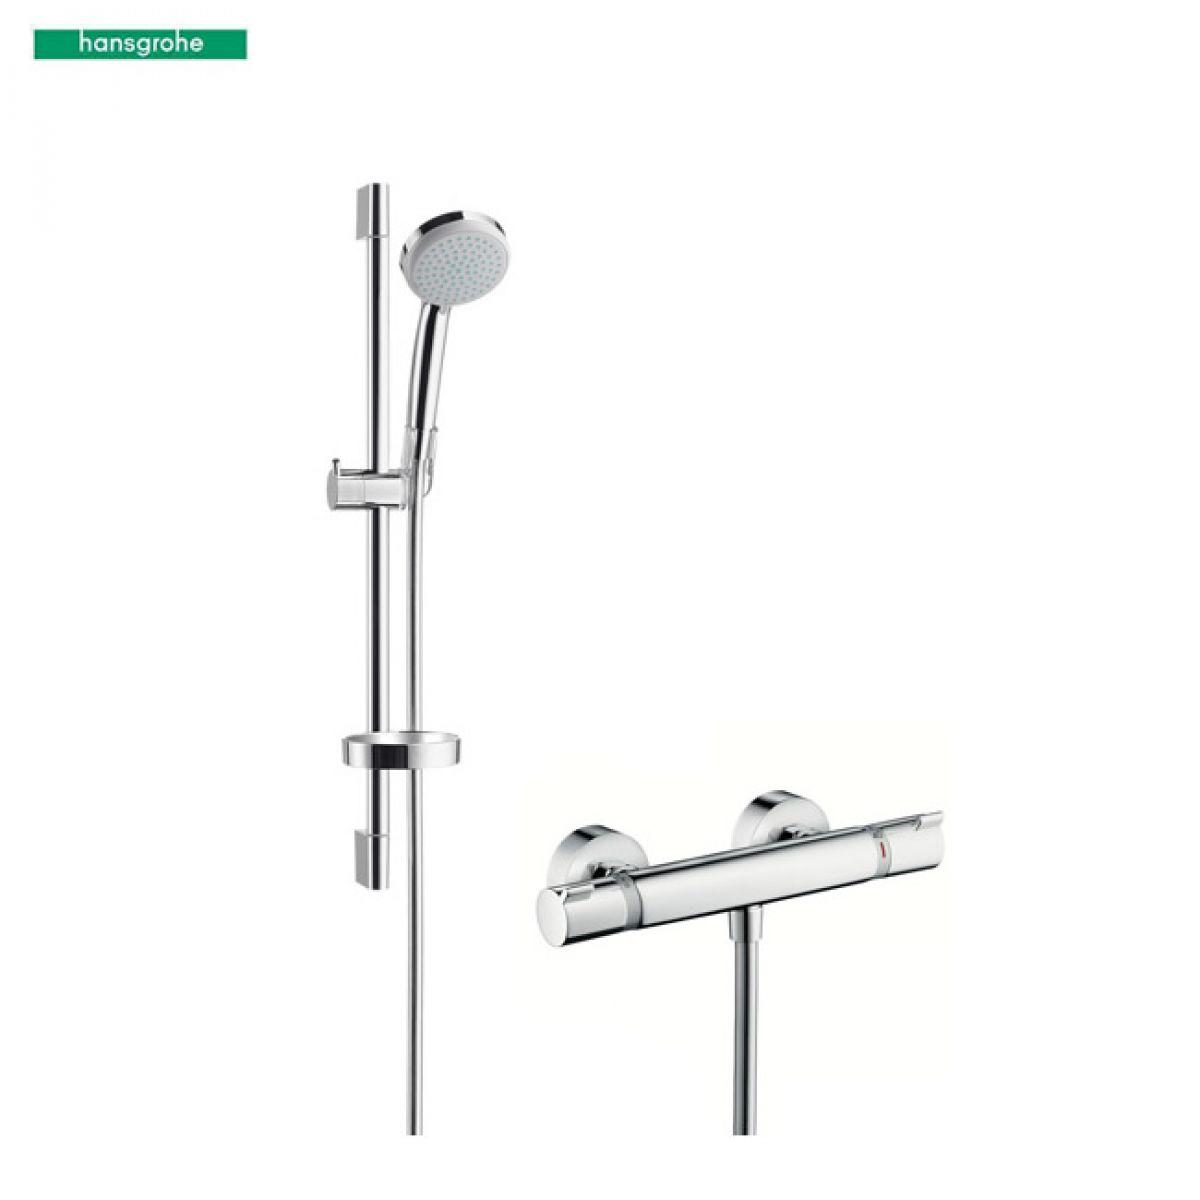 Hervorragend Hansgrohe Croma 100 Vario/Ecostat Comfort Combi 0.65m Shower Set  QT13